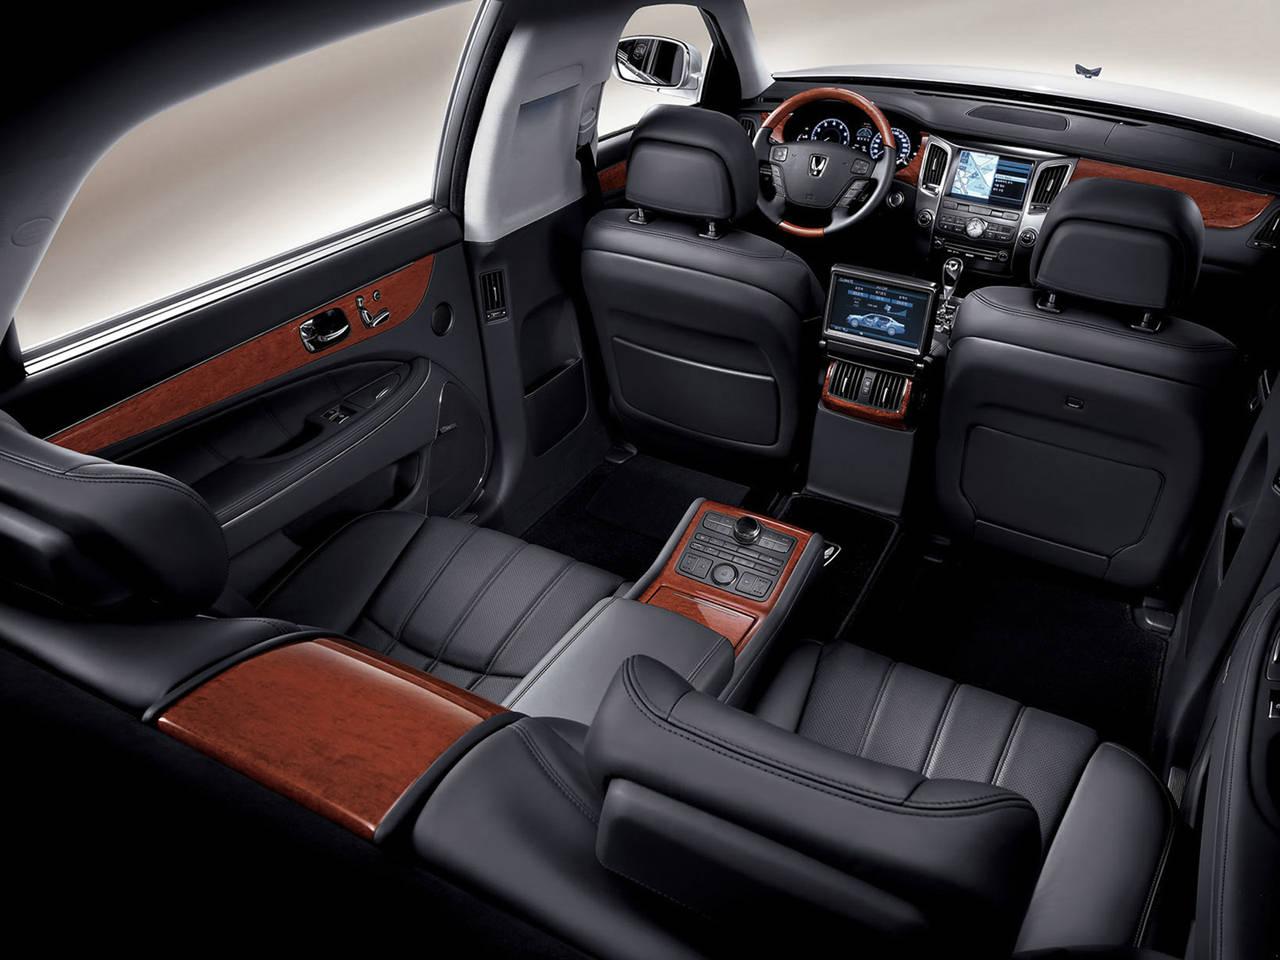 New Premium Showrooms For Genesis And Equus Hyundai Will